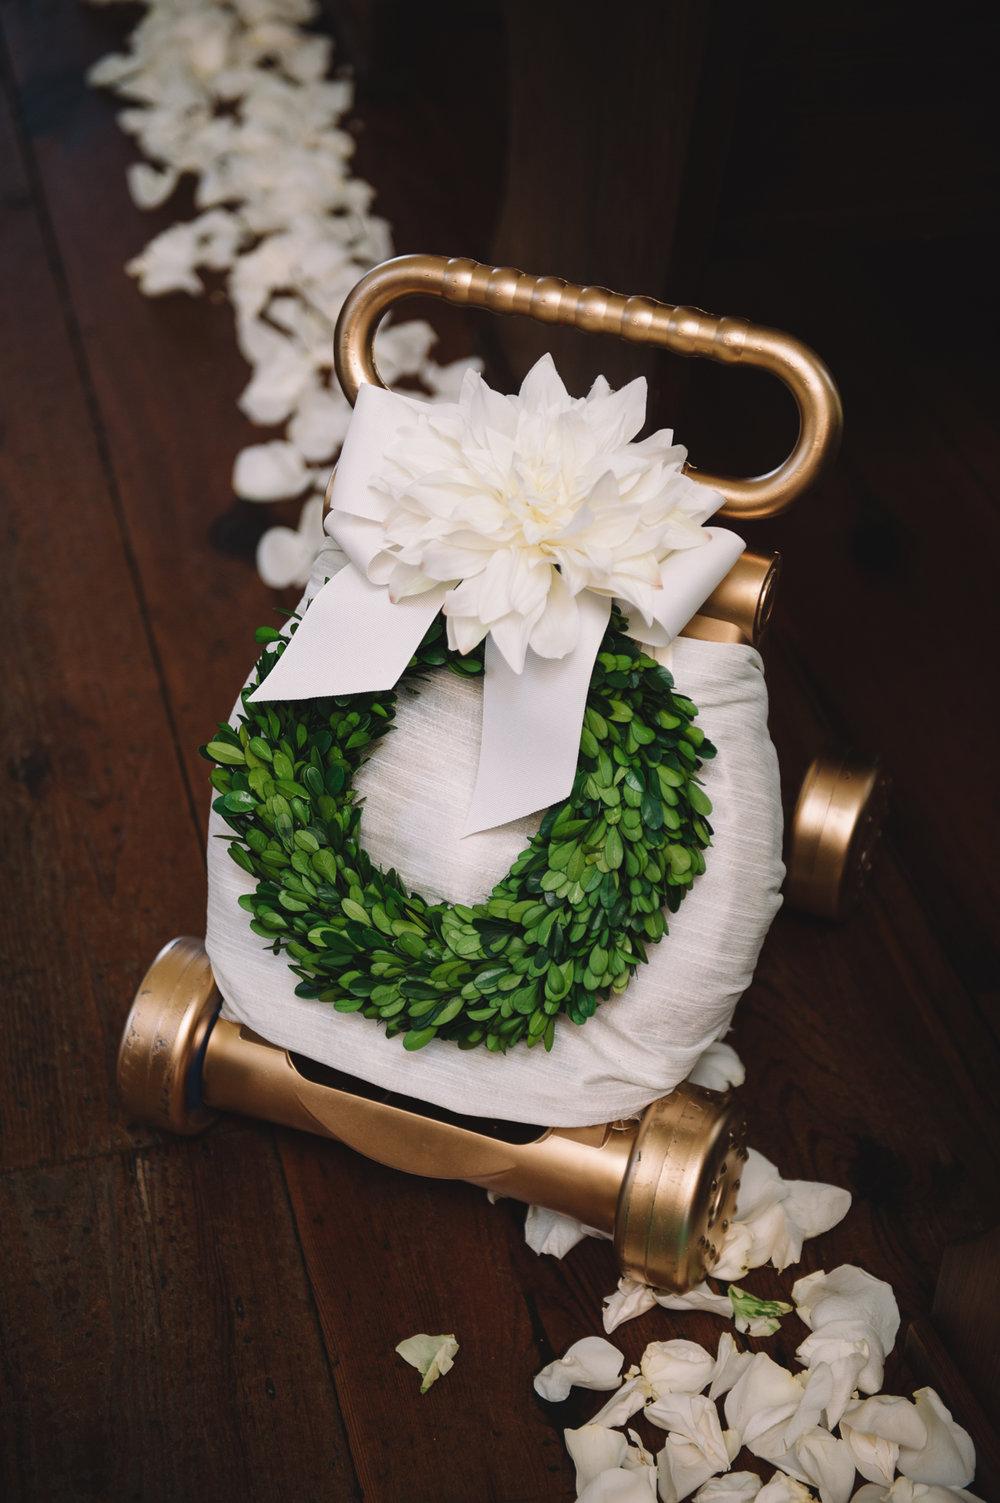 Blush and White Palmetto Bluff wedding by Jennings King Photography and Kelli Corn